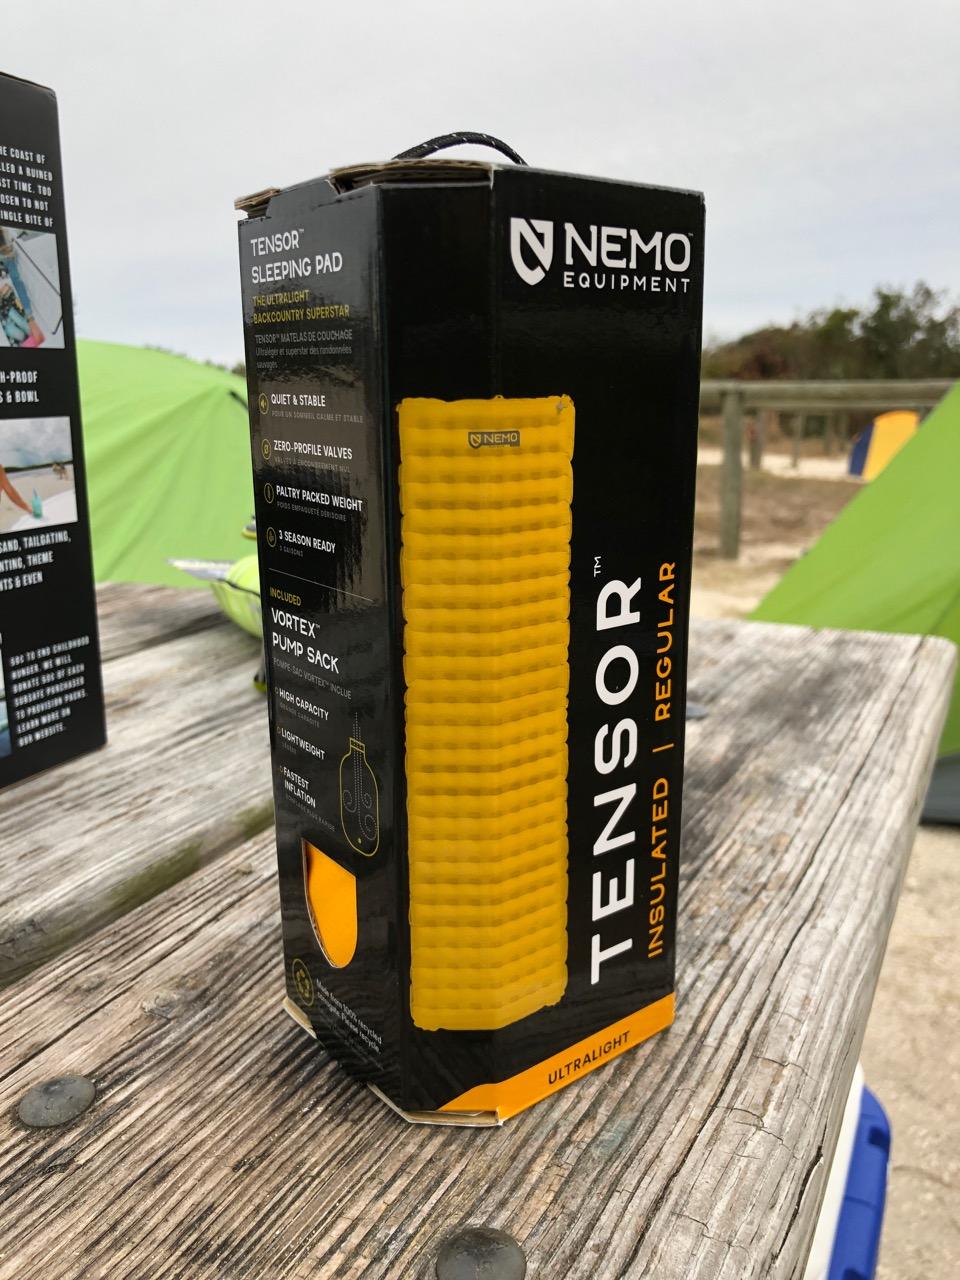 NEMO Tensor (2019) Ultralight Insulated Sleeping Pad Review: Best of